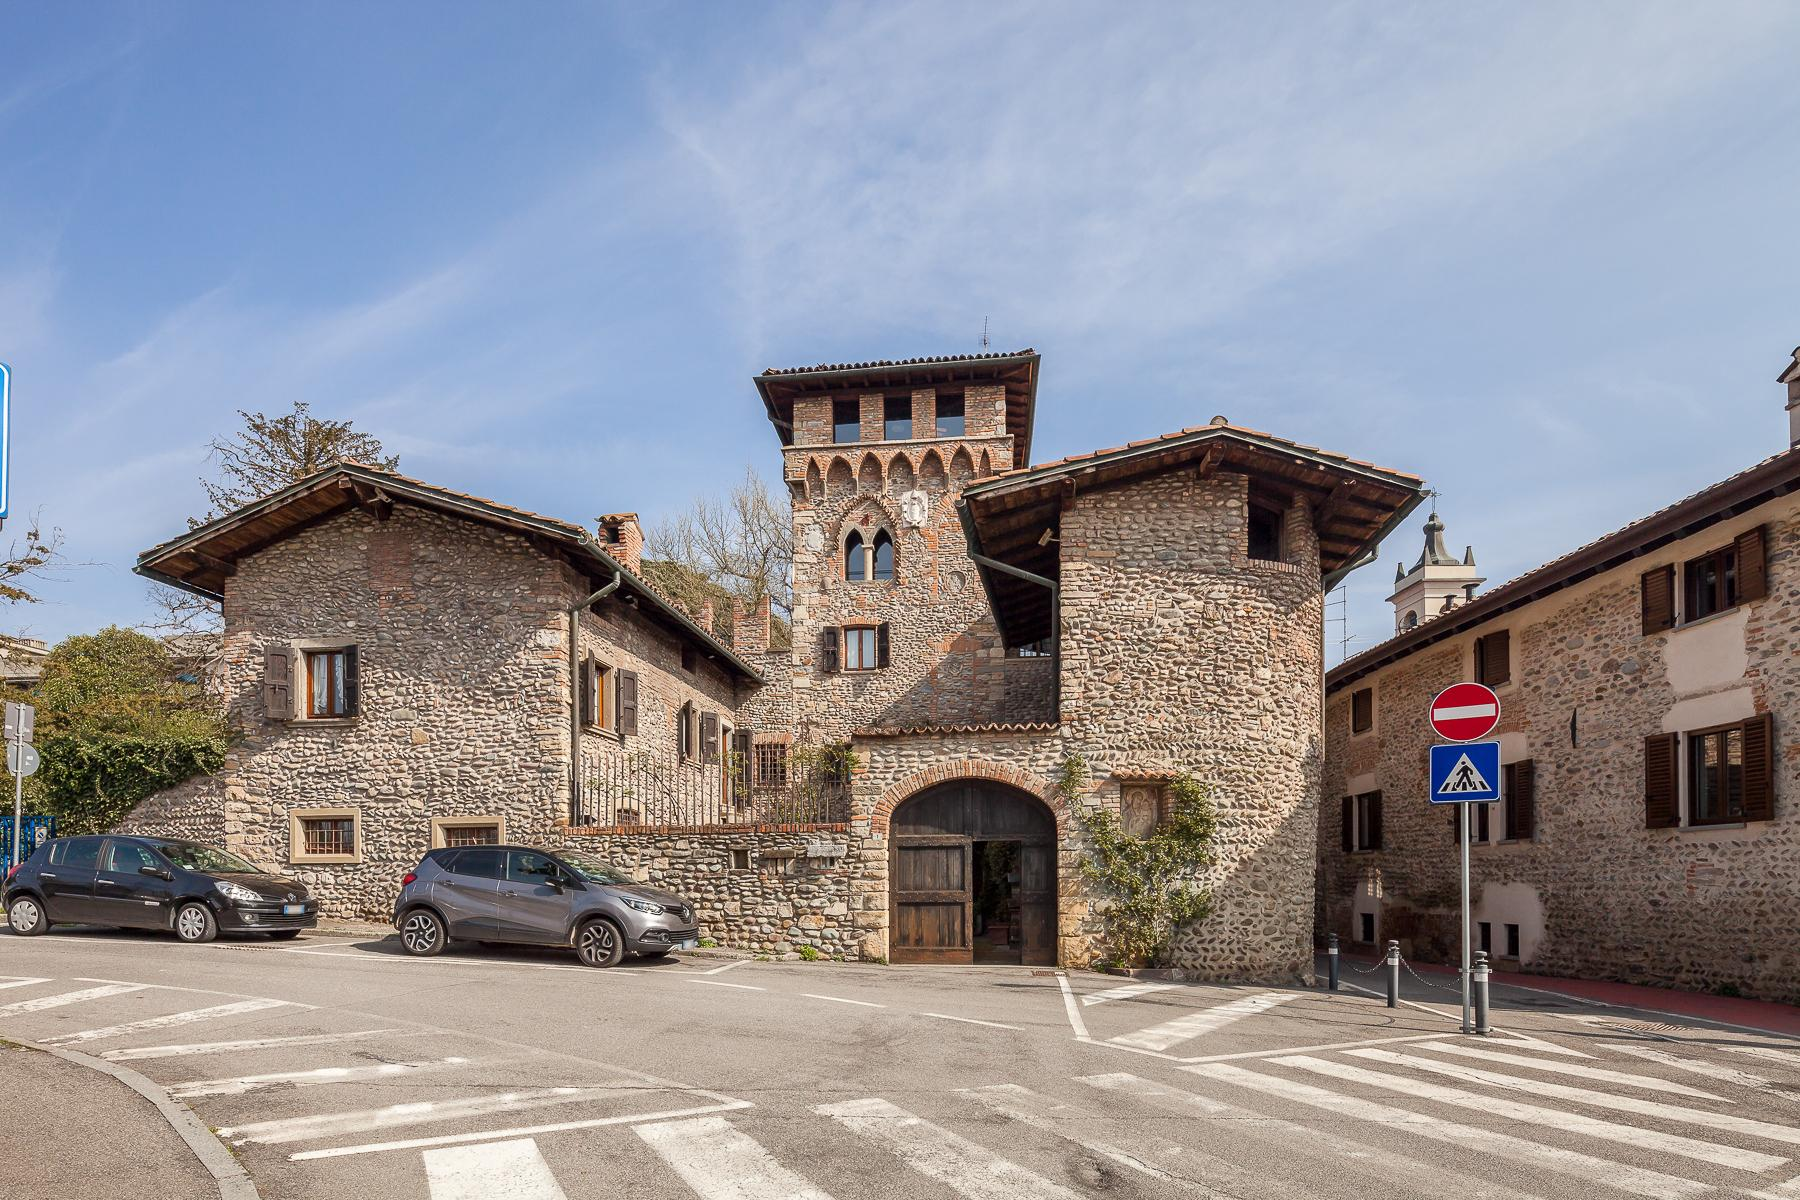 Ravissant château du XIIIe siècle - 2